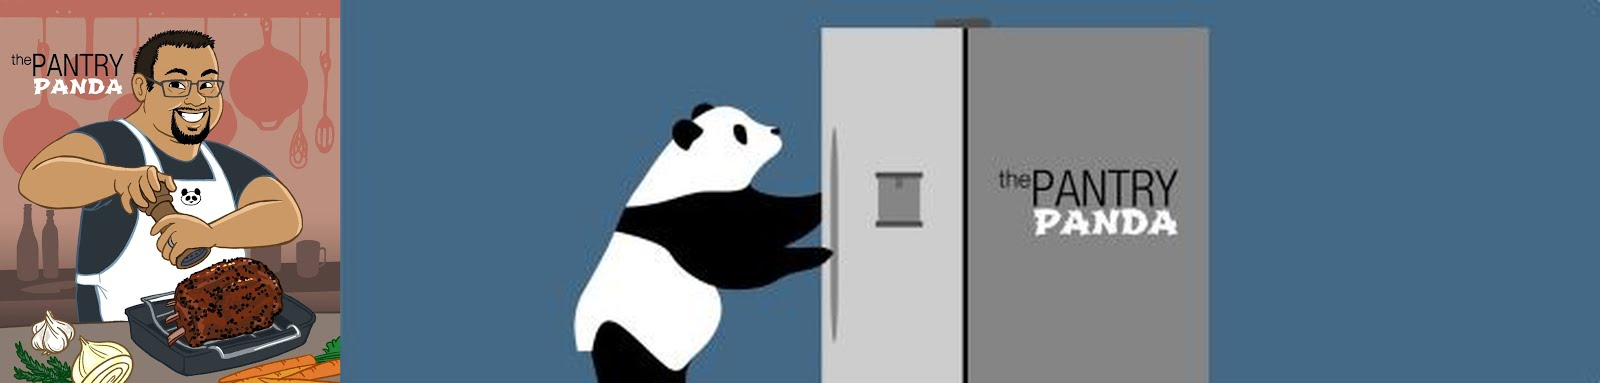 THE PANTRY PANDA